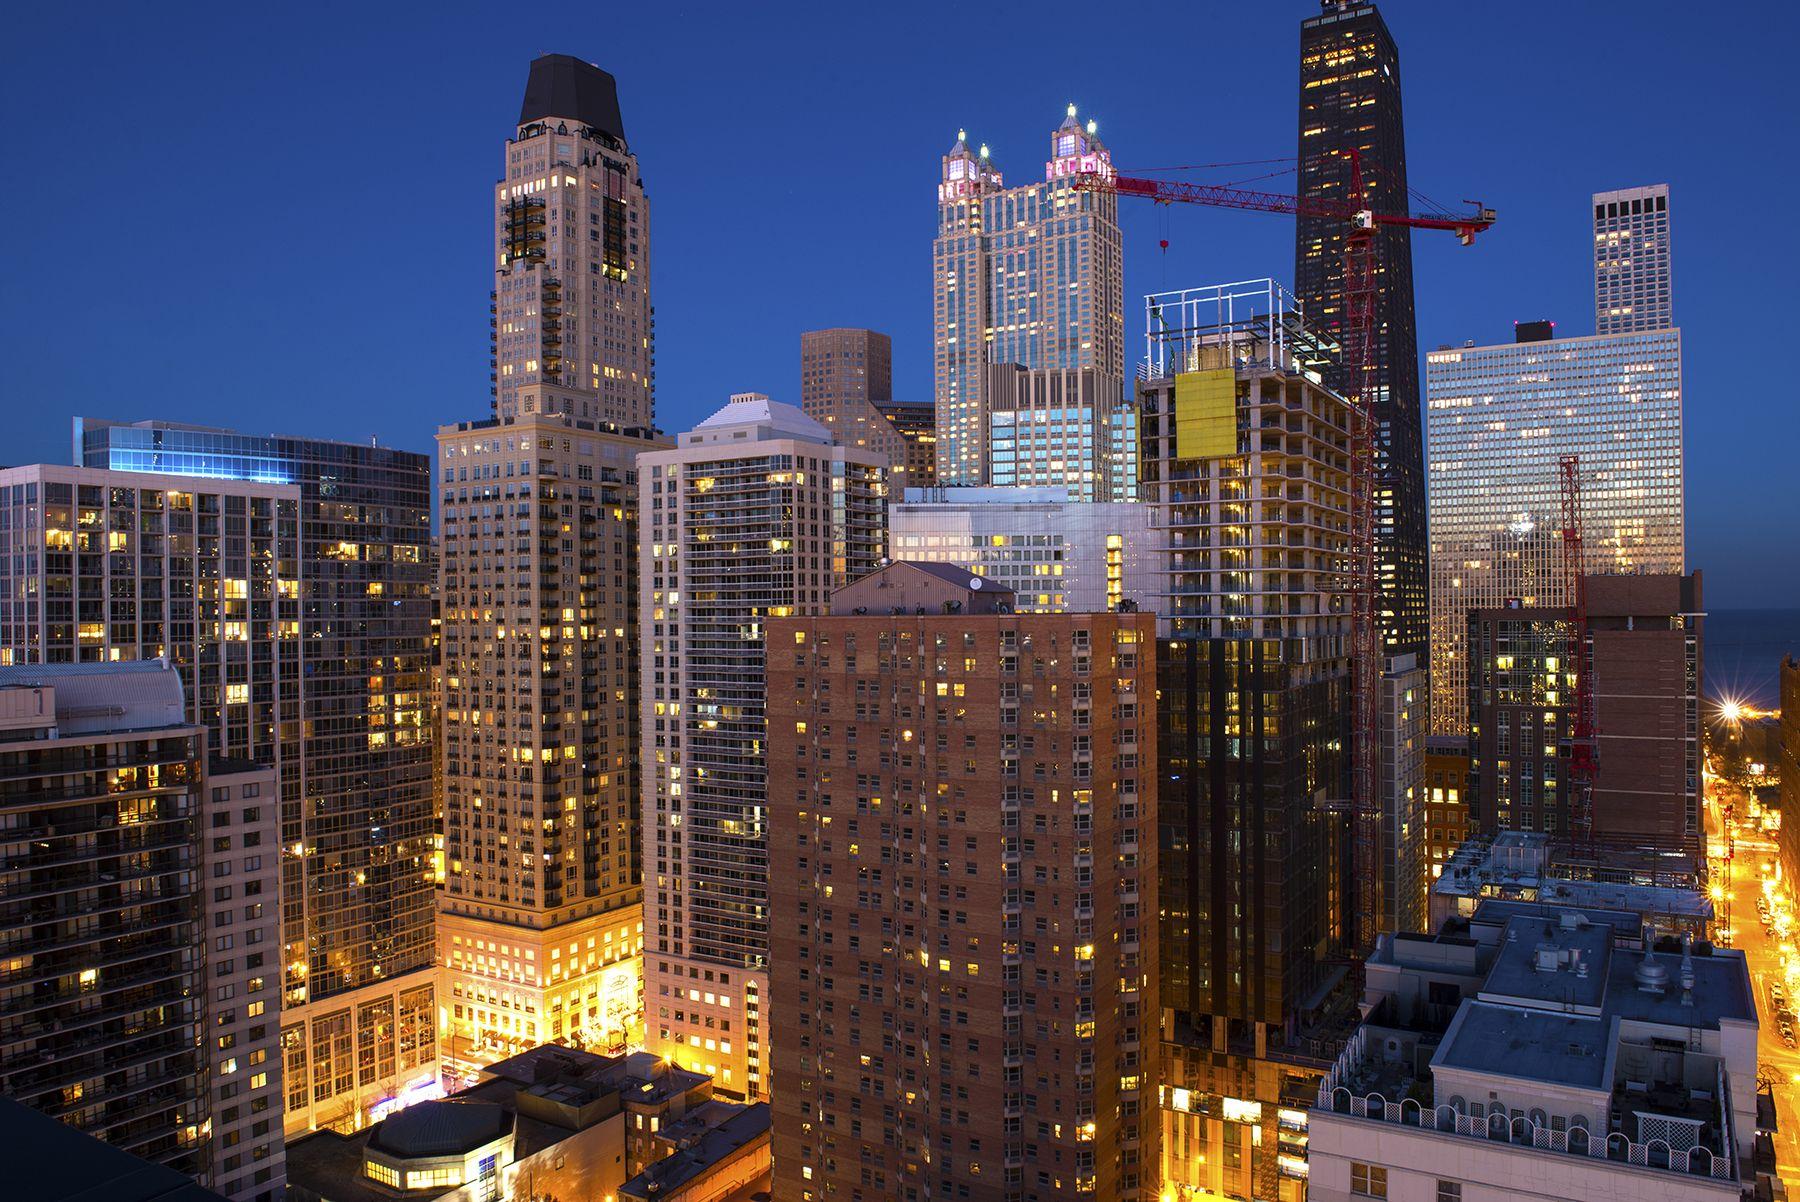 55 West Chestnut | Chicago apartment, Gold coast, Chicago